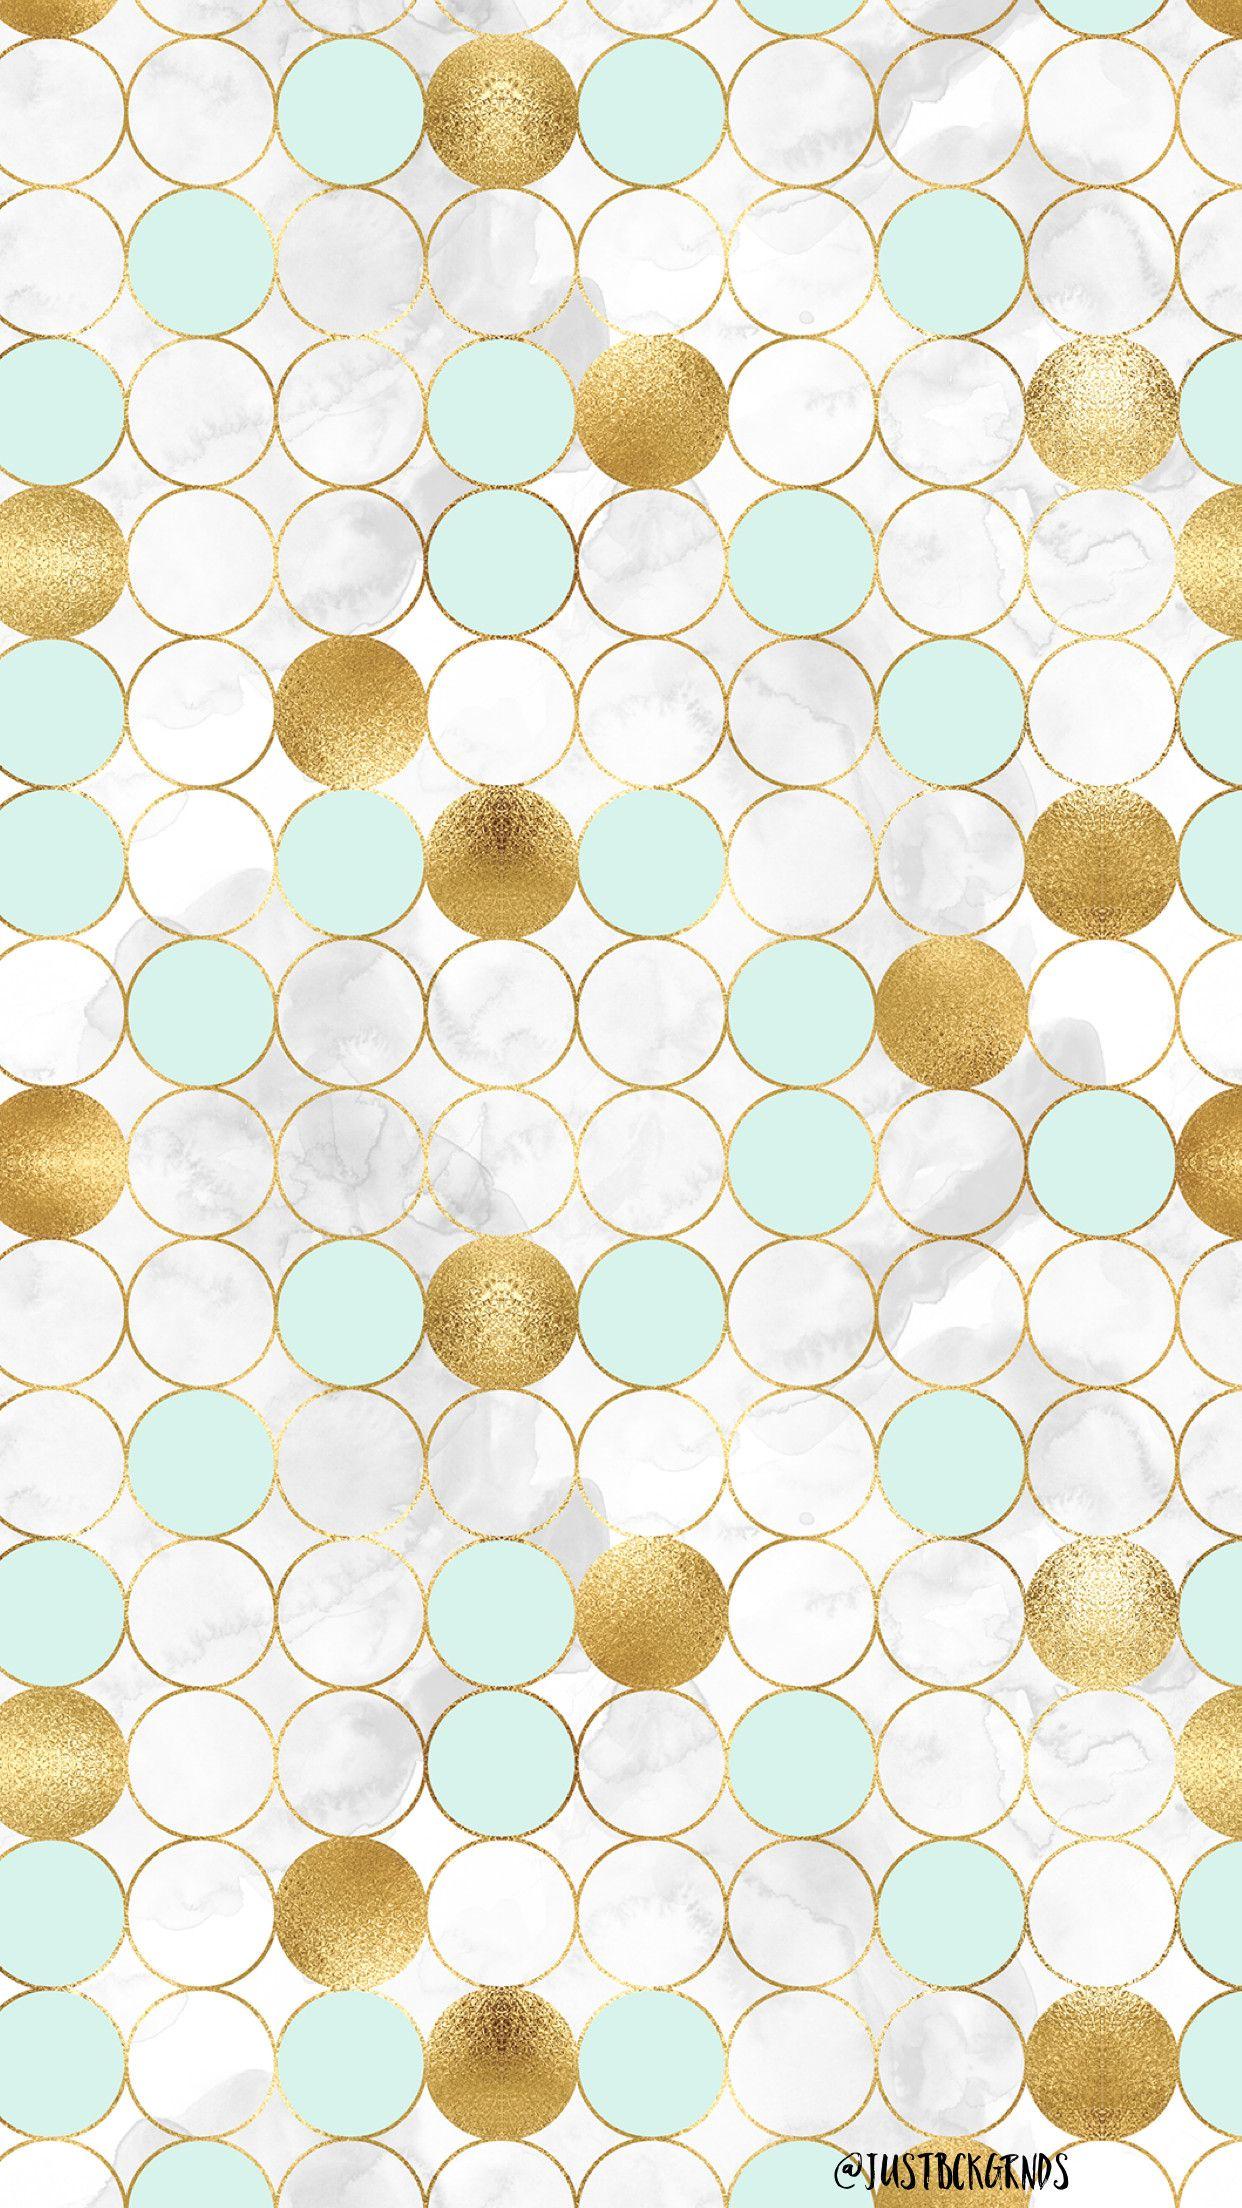 Cute Wallpapers Teal Mint Green Wallpaper Iphone Mint Green Wallpaper Mint Wallpaper